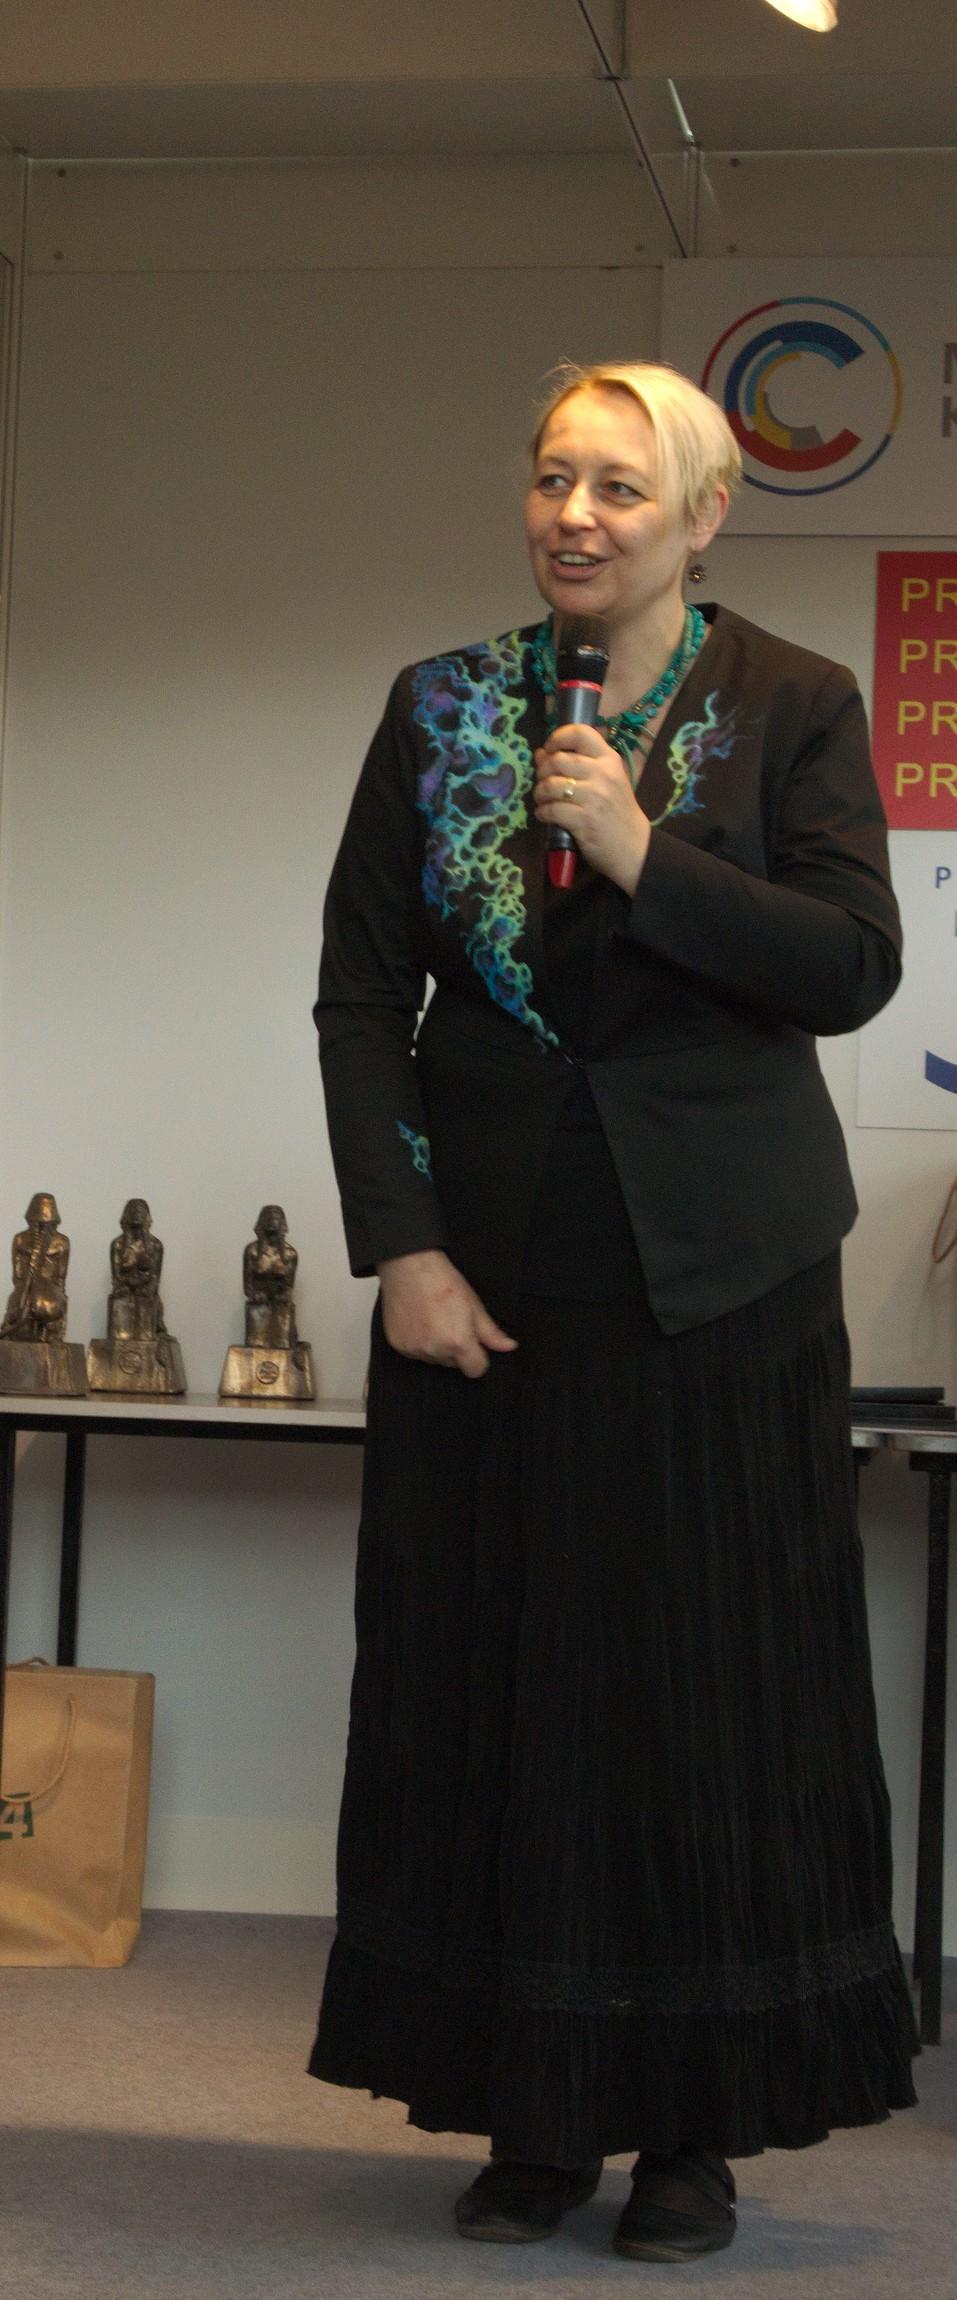 Vilma Kadlečková in 2015